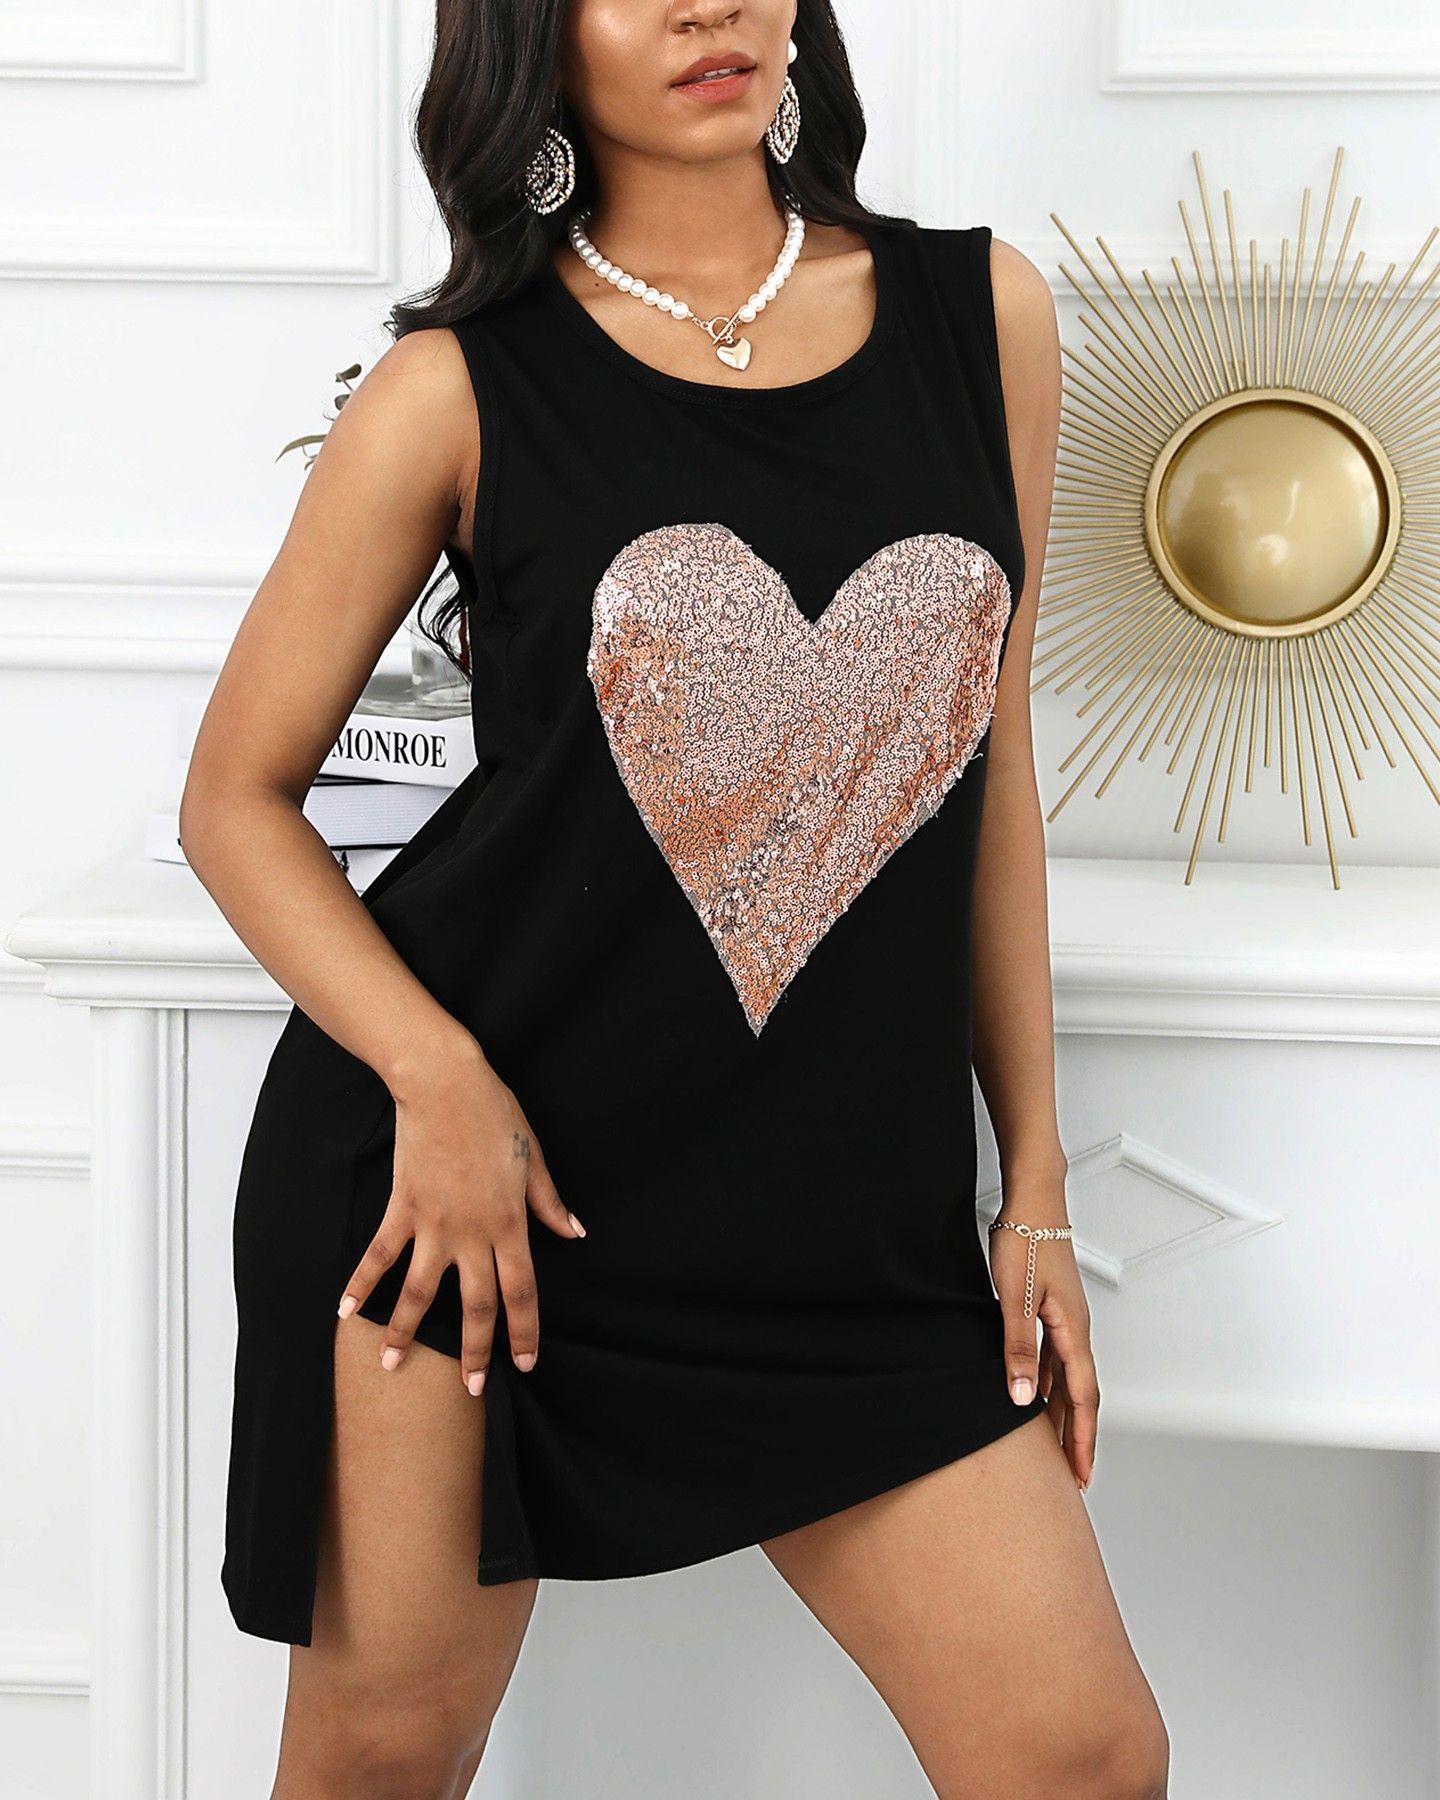 Crew Neck Designer Womens Tshirt Casual Sleeveless Loose Spilt Tops Womens Clothing Love Printed Tees Female